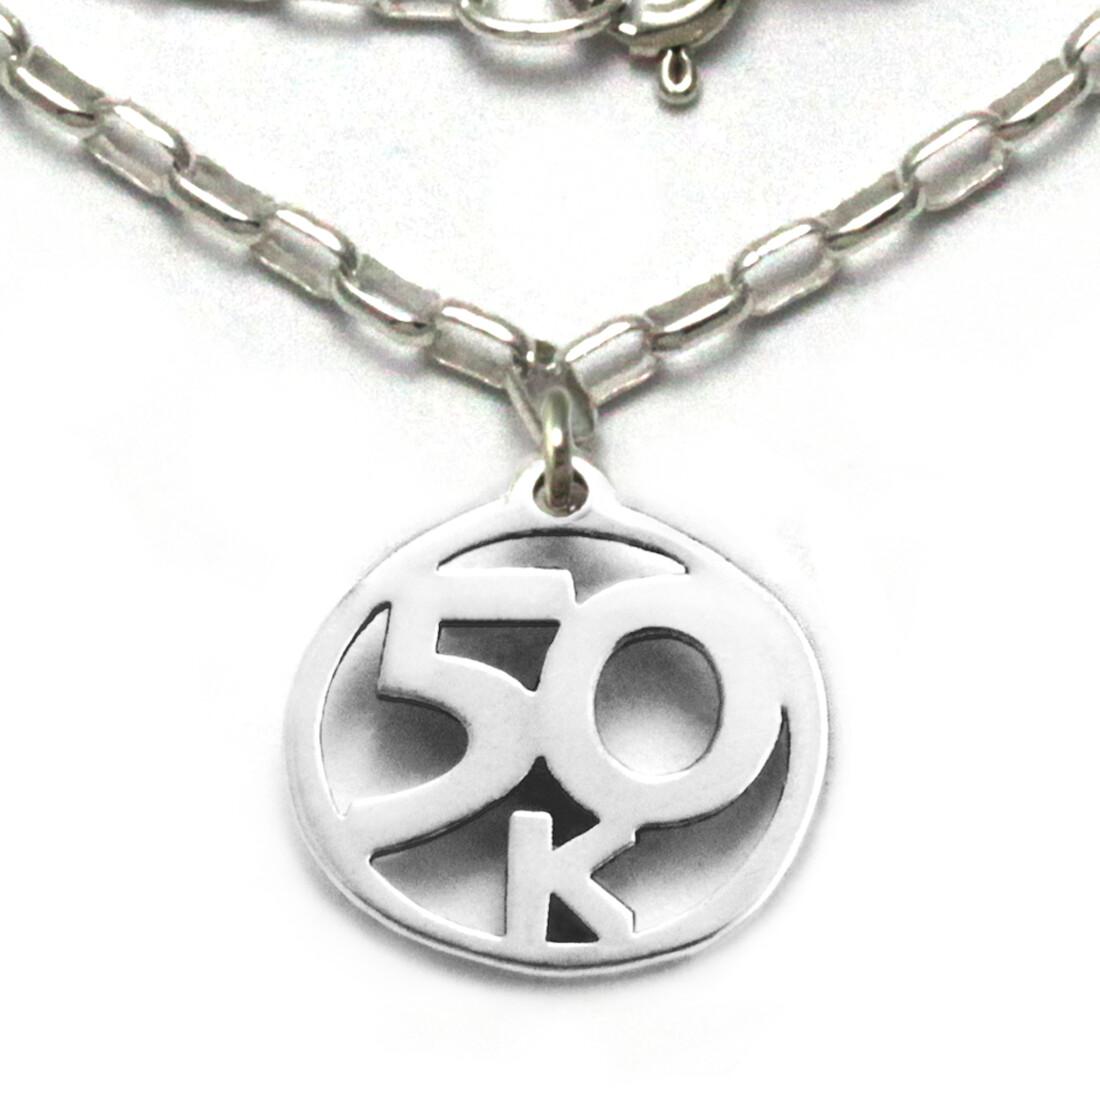 50k Necklace Sterling Silver